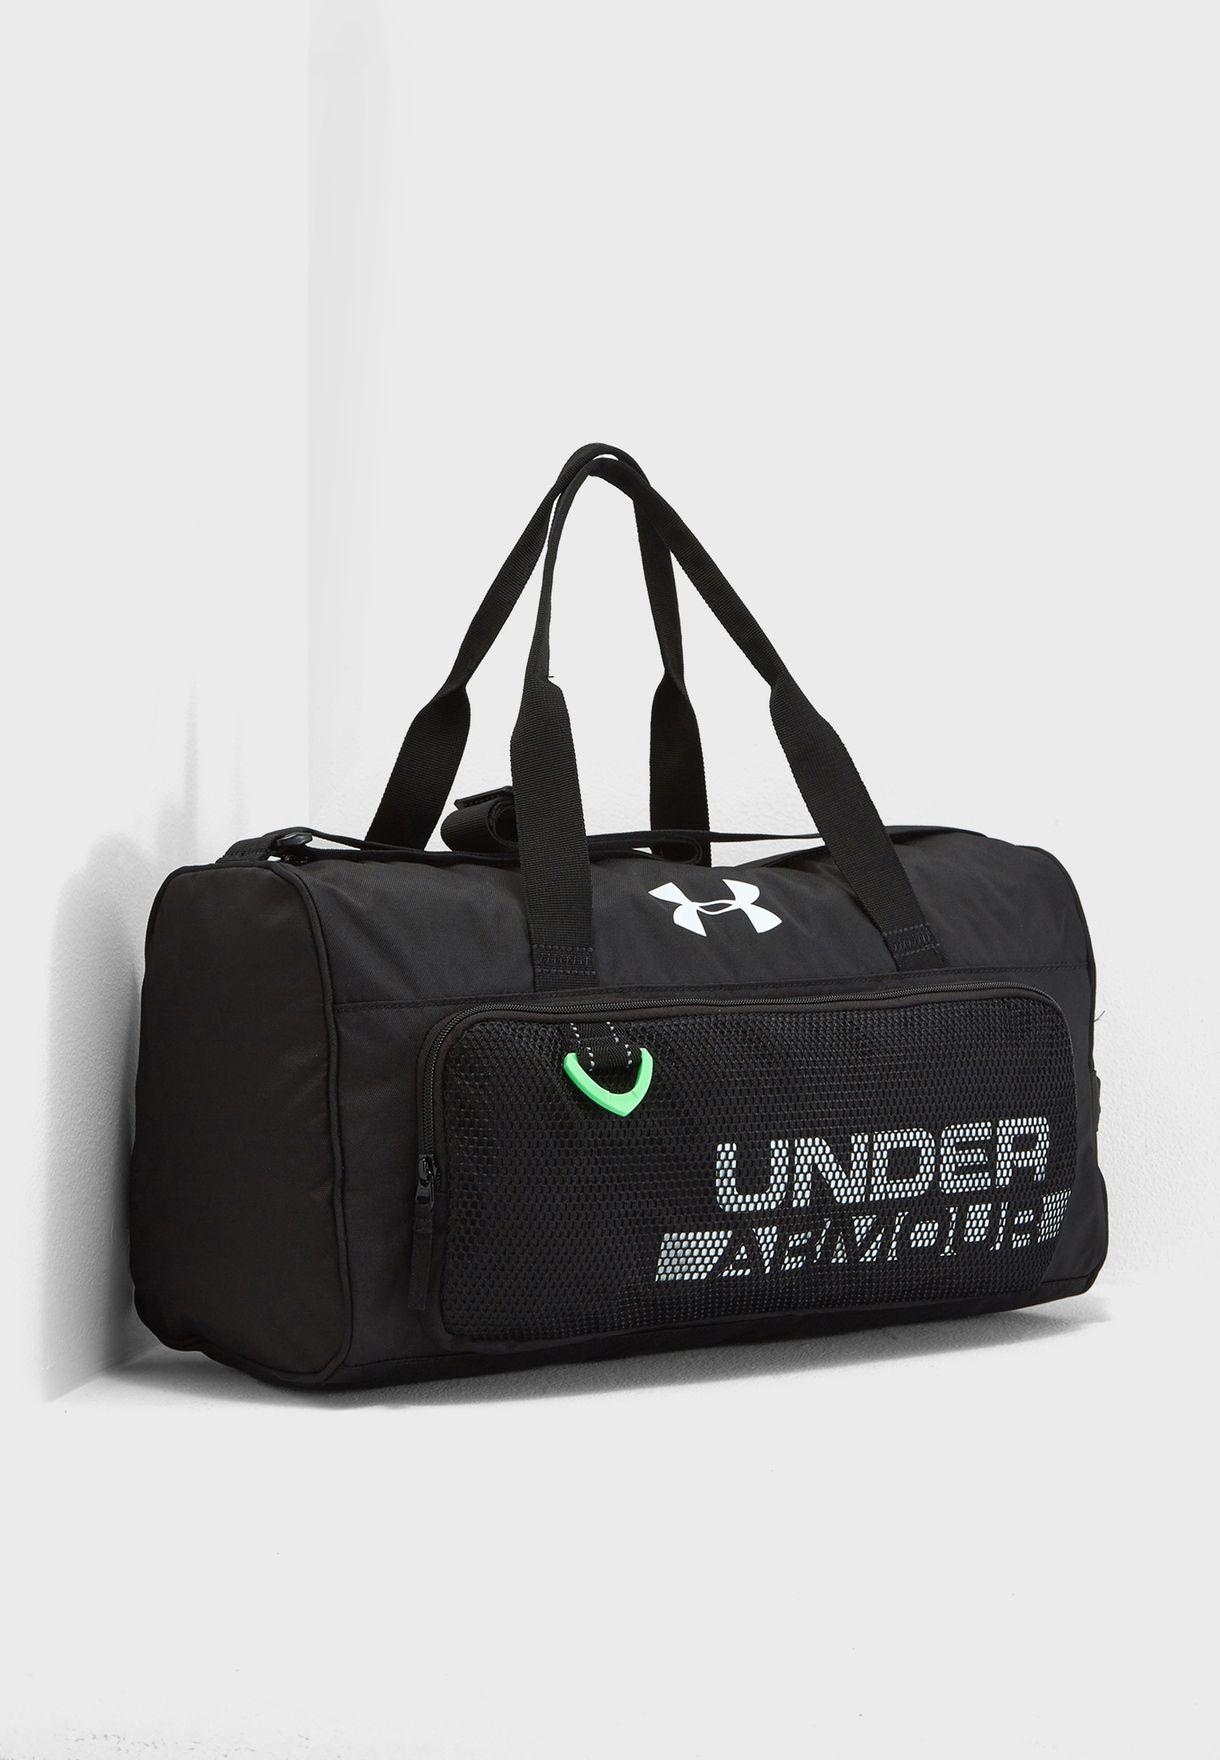 290a97426eb0 Shop Under Armour black Kids Logo Duffel Bag 1308787-001 for Kids in ...